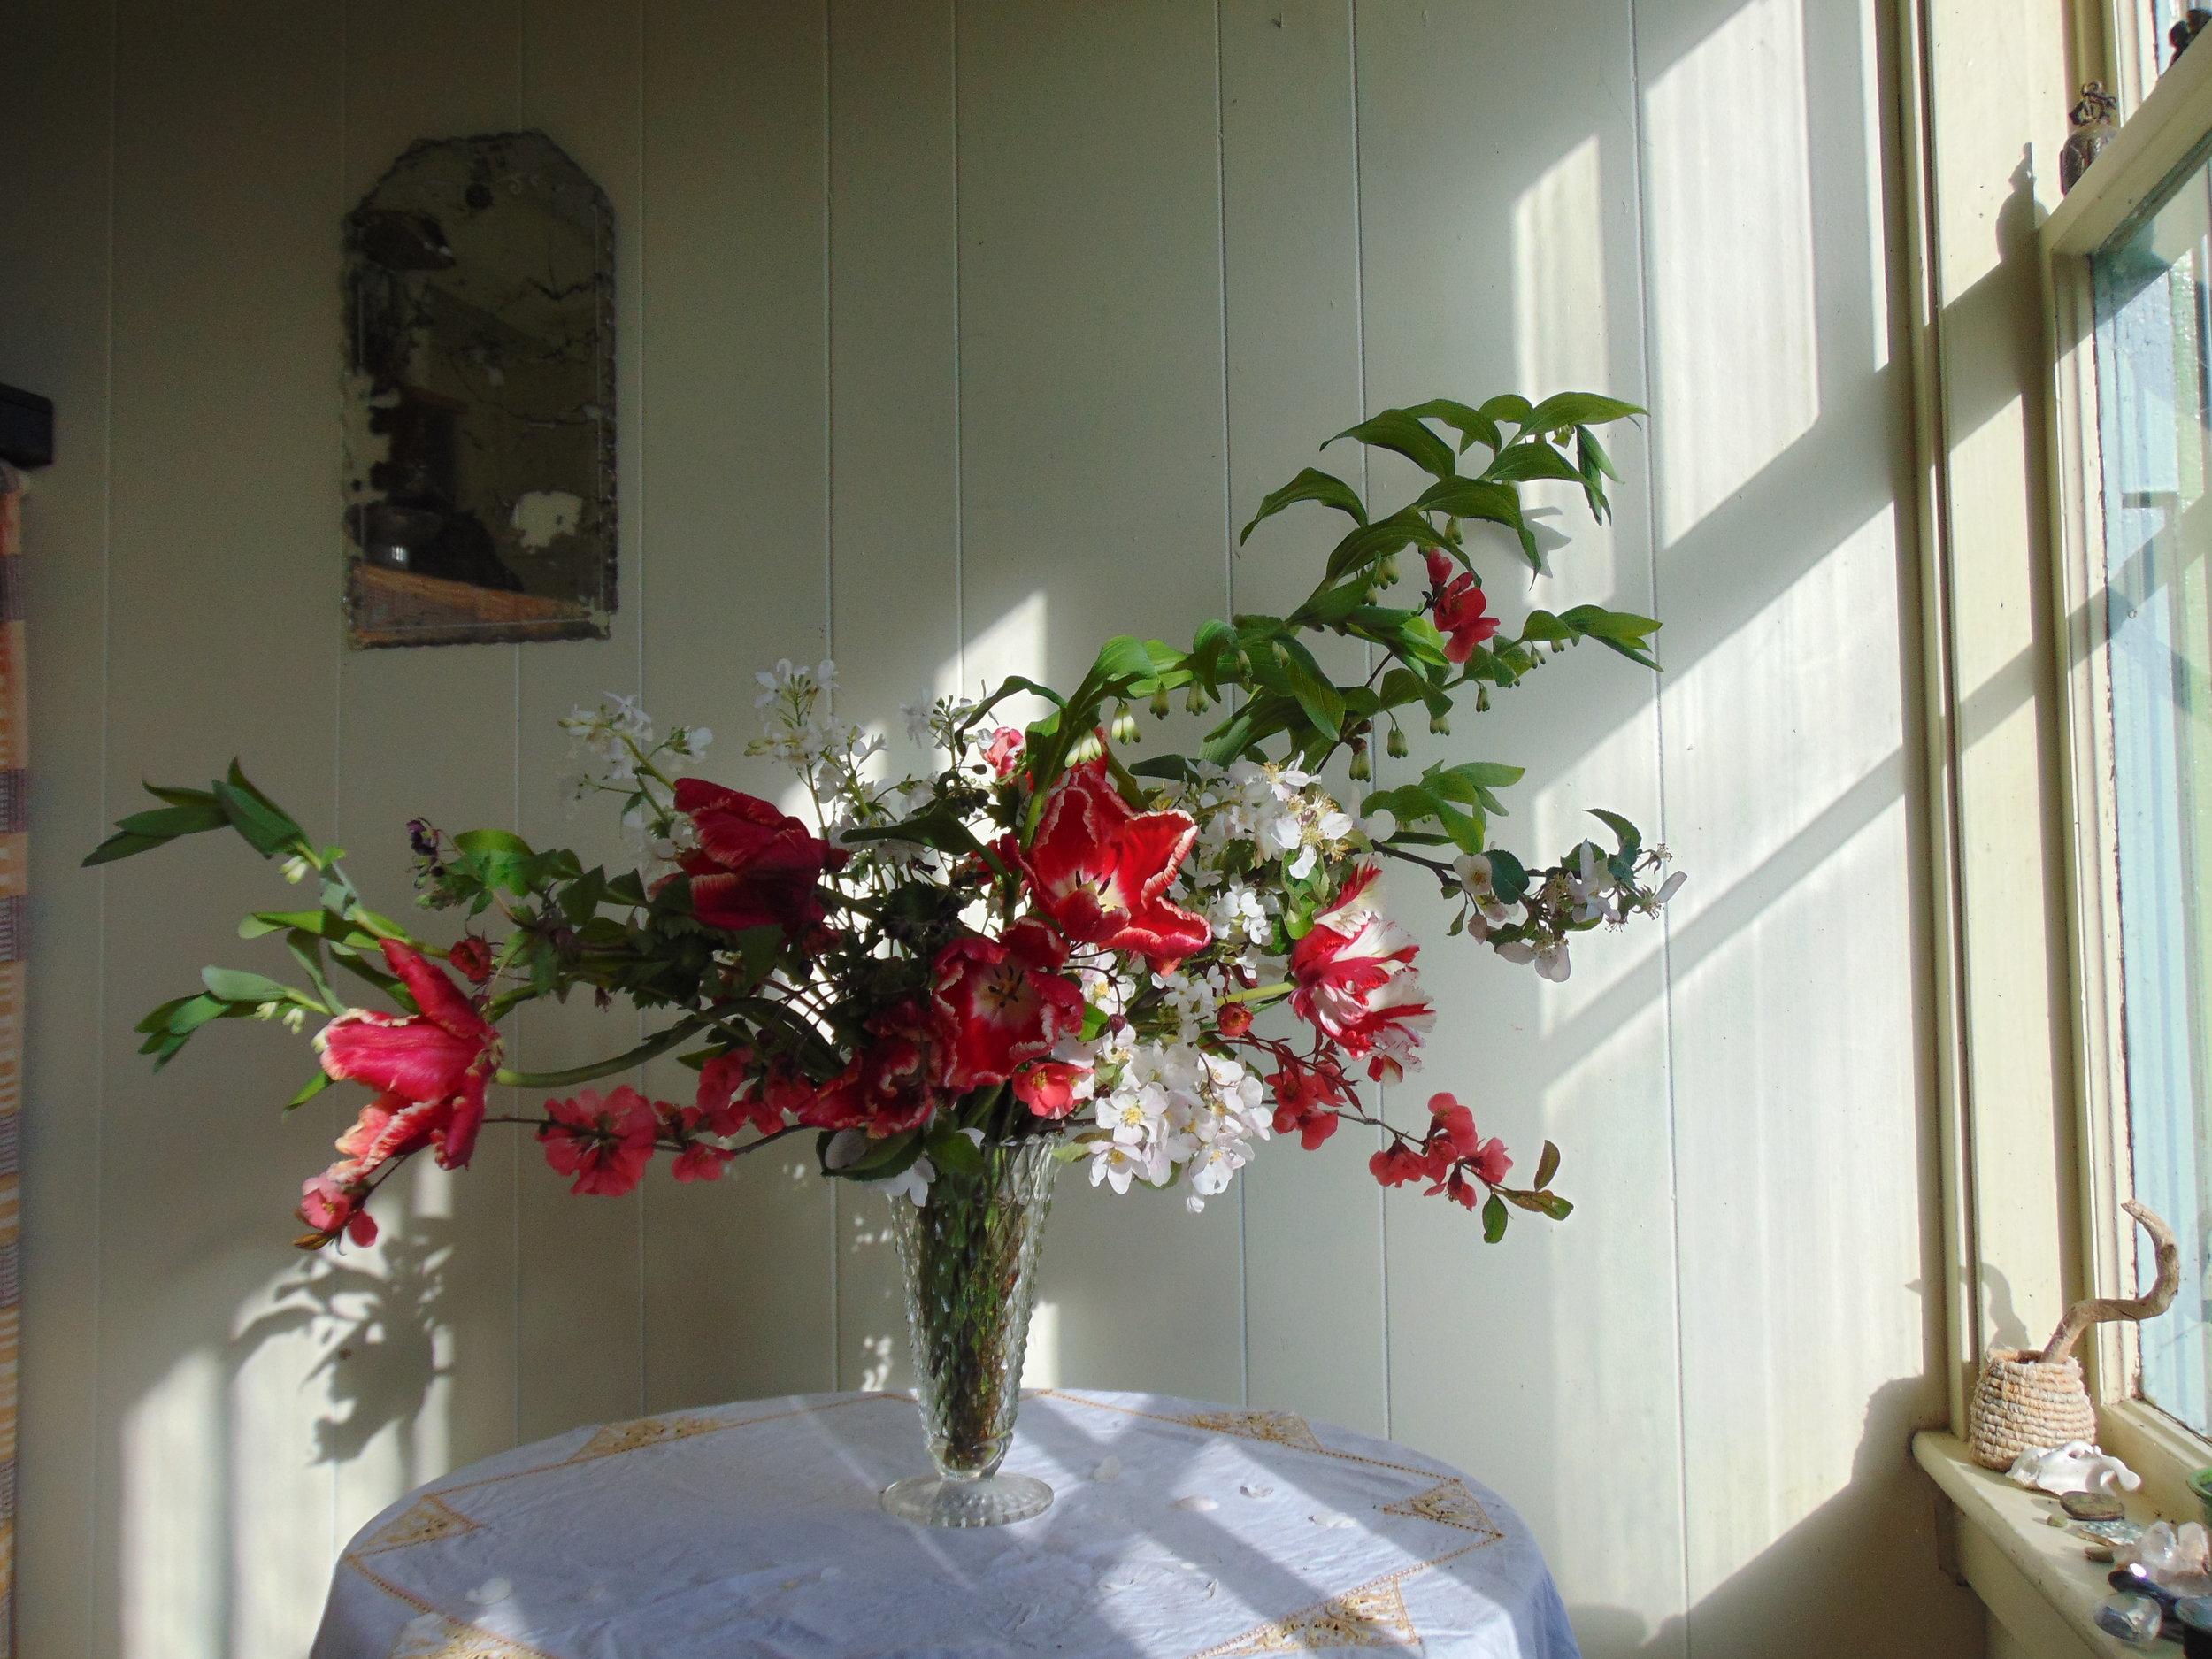 Fresh cut local flowers and floral design. Hedgerow, Nova Scotia.